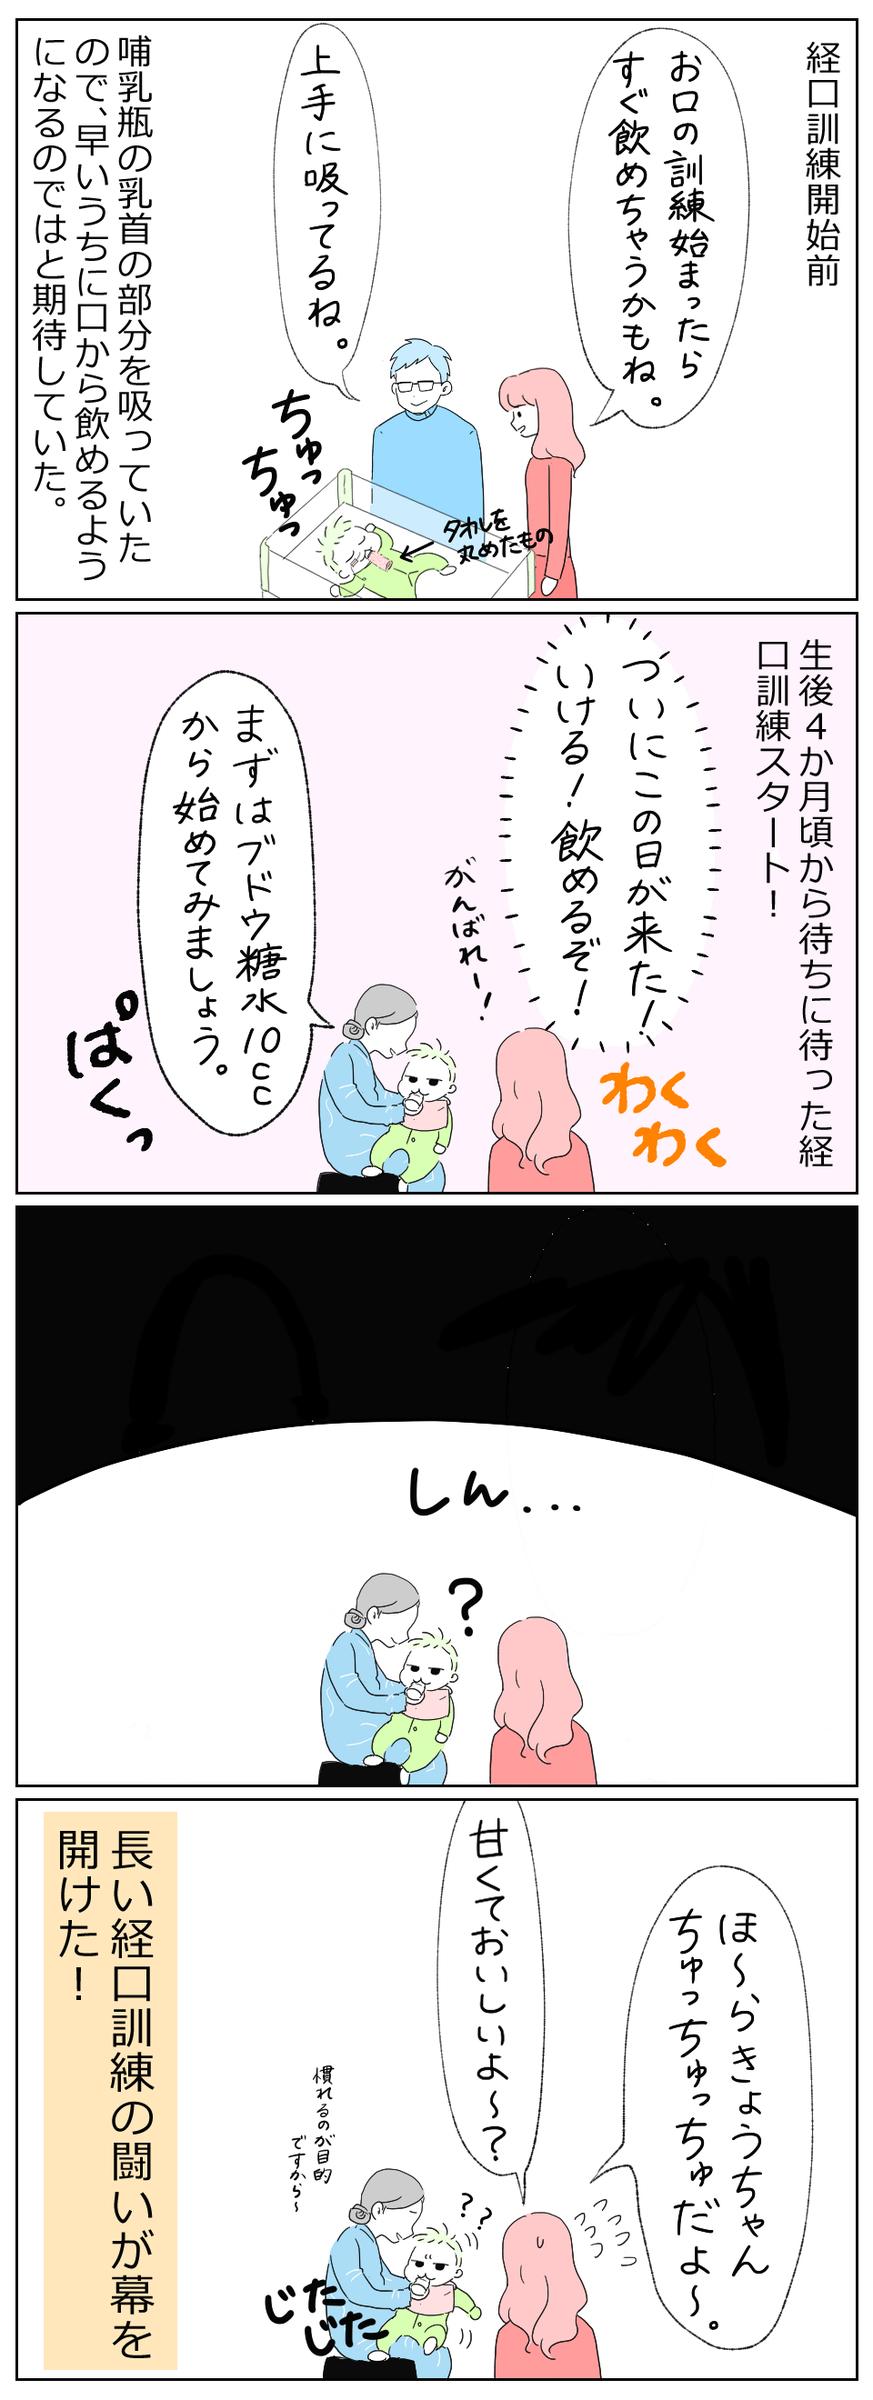 f:id:kayarimo:20190315220619j:plain